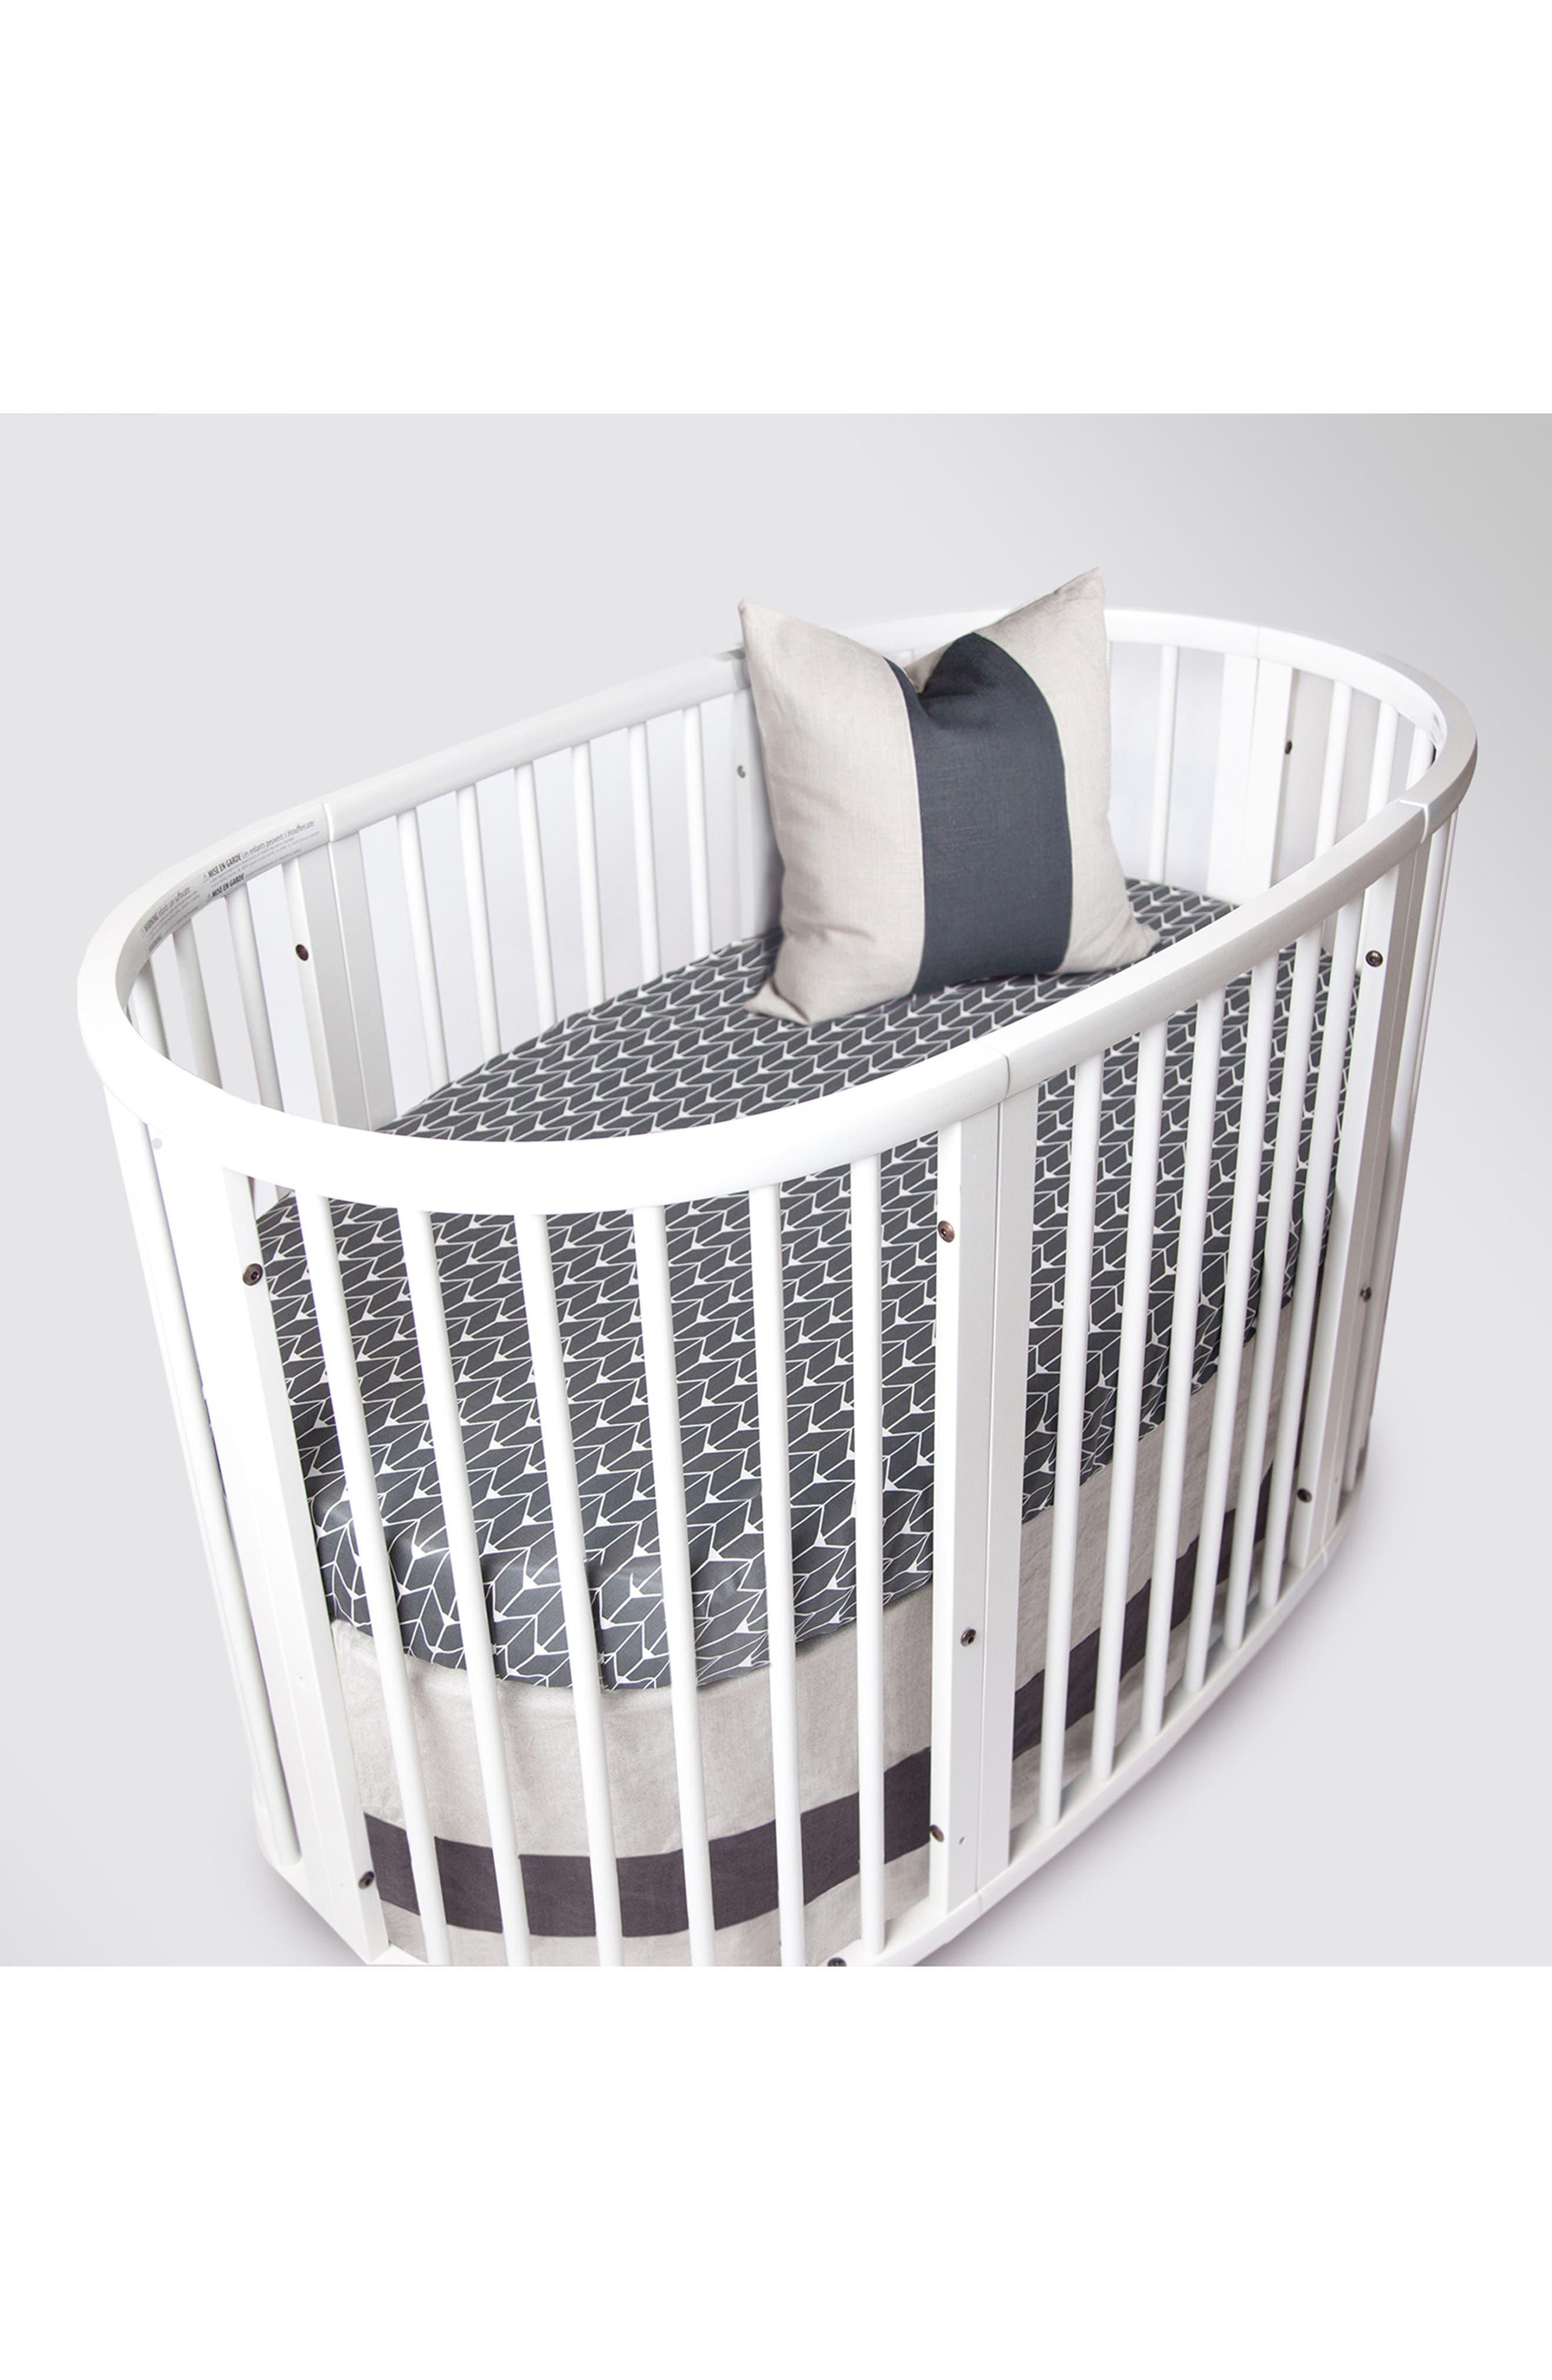 300 Thread Count Crib Sheet for Stokke Sleepi Crib,                             Alternate thumbnail 5, color,                             Charcoal